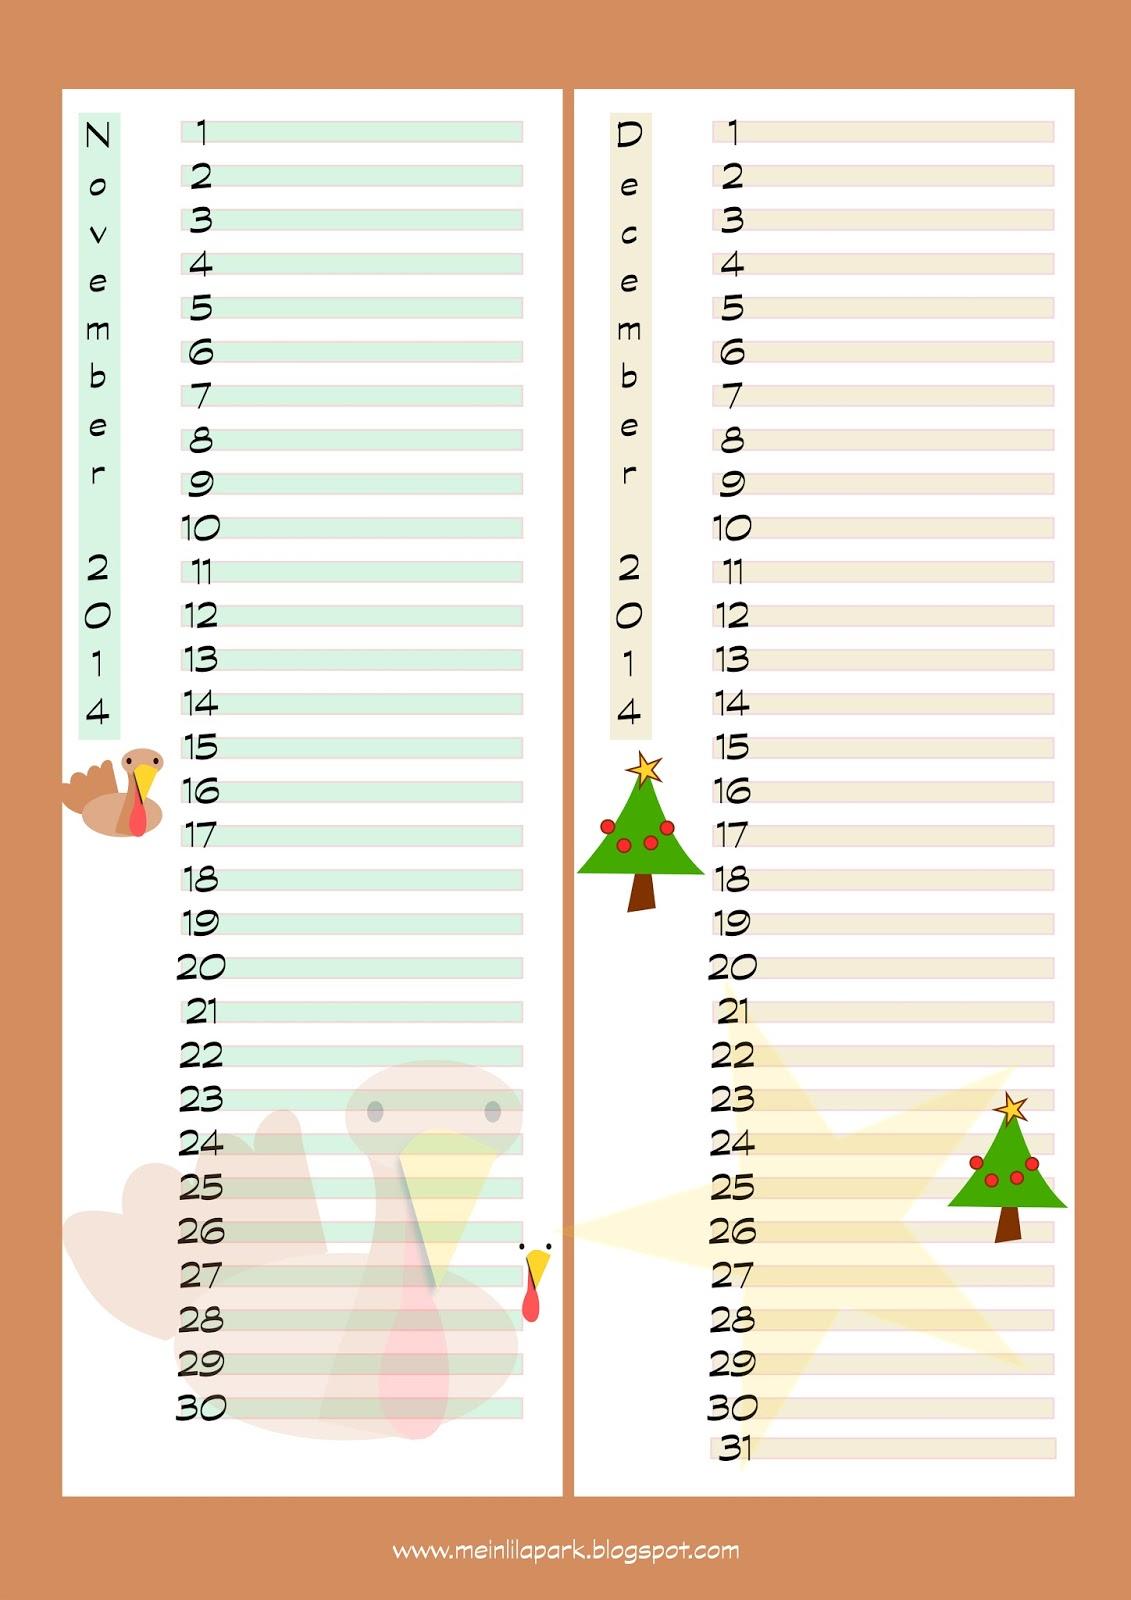 Free printable 2014 calendar planners - ausdruckbare Kalender